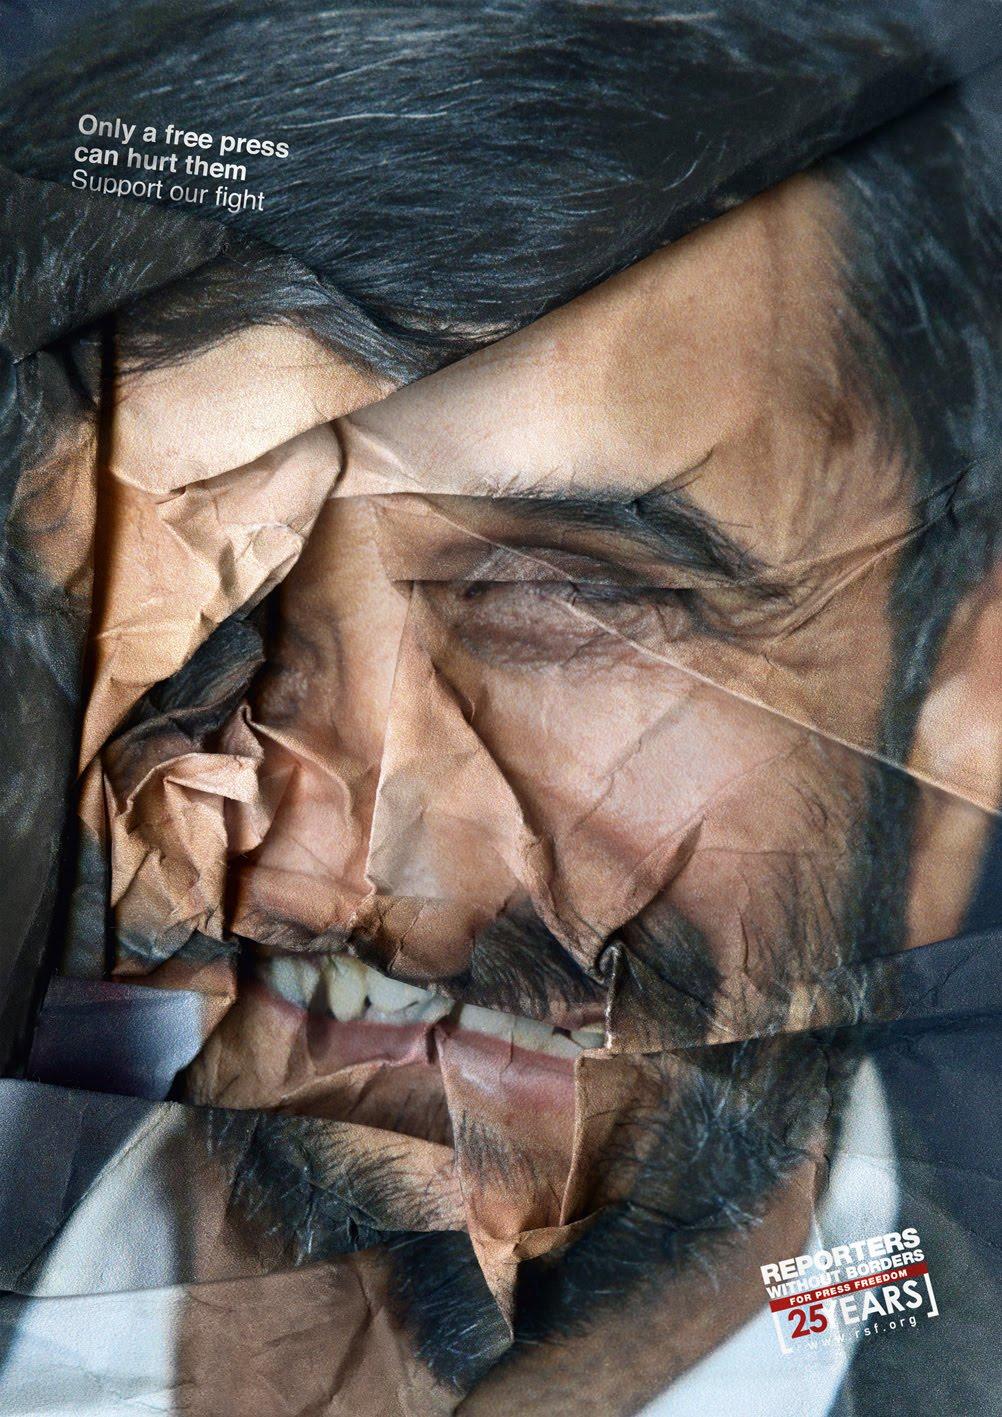 http://4.bp.blogspot.com/_42nL05s3A-8/S-A47MAhXhI/AAAAAAAACjQ/izNqhAoypO4/s1600/reporters_Ahmadinejad_1.jpg